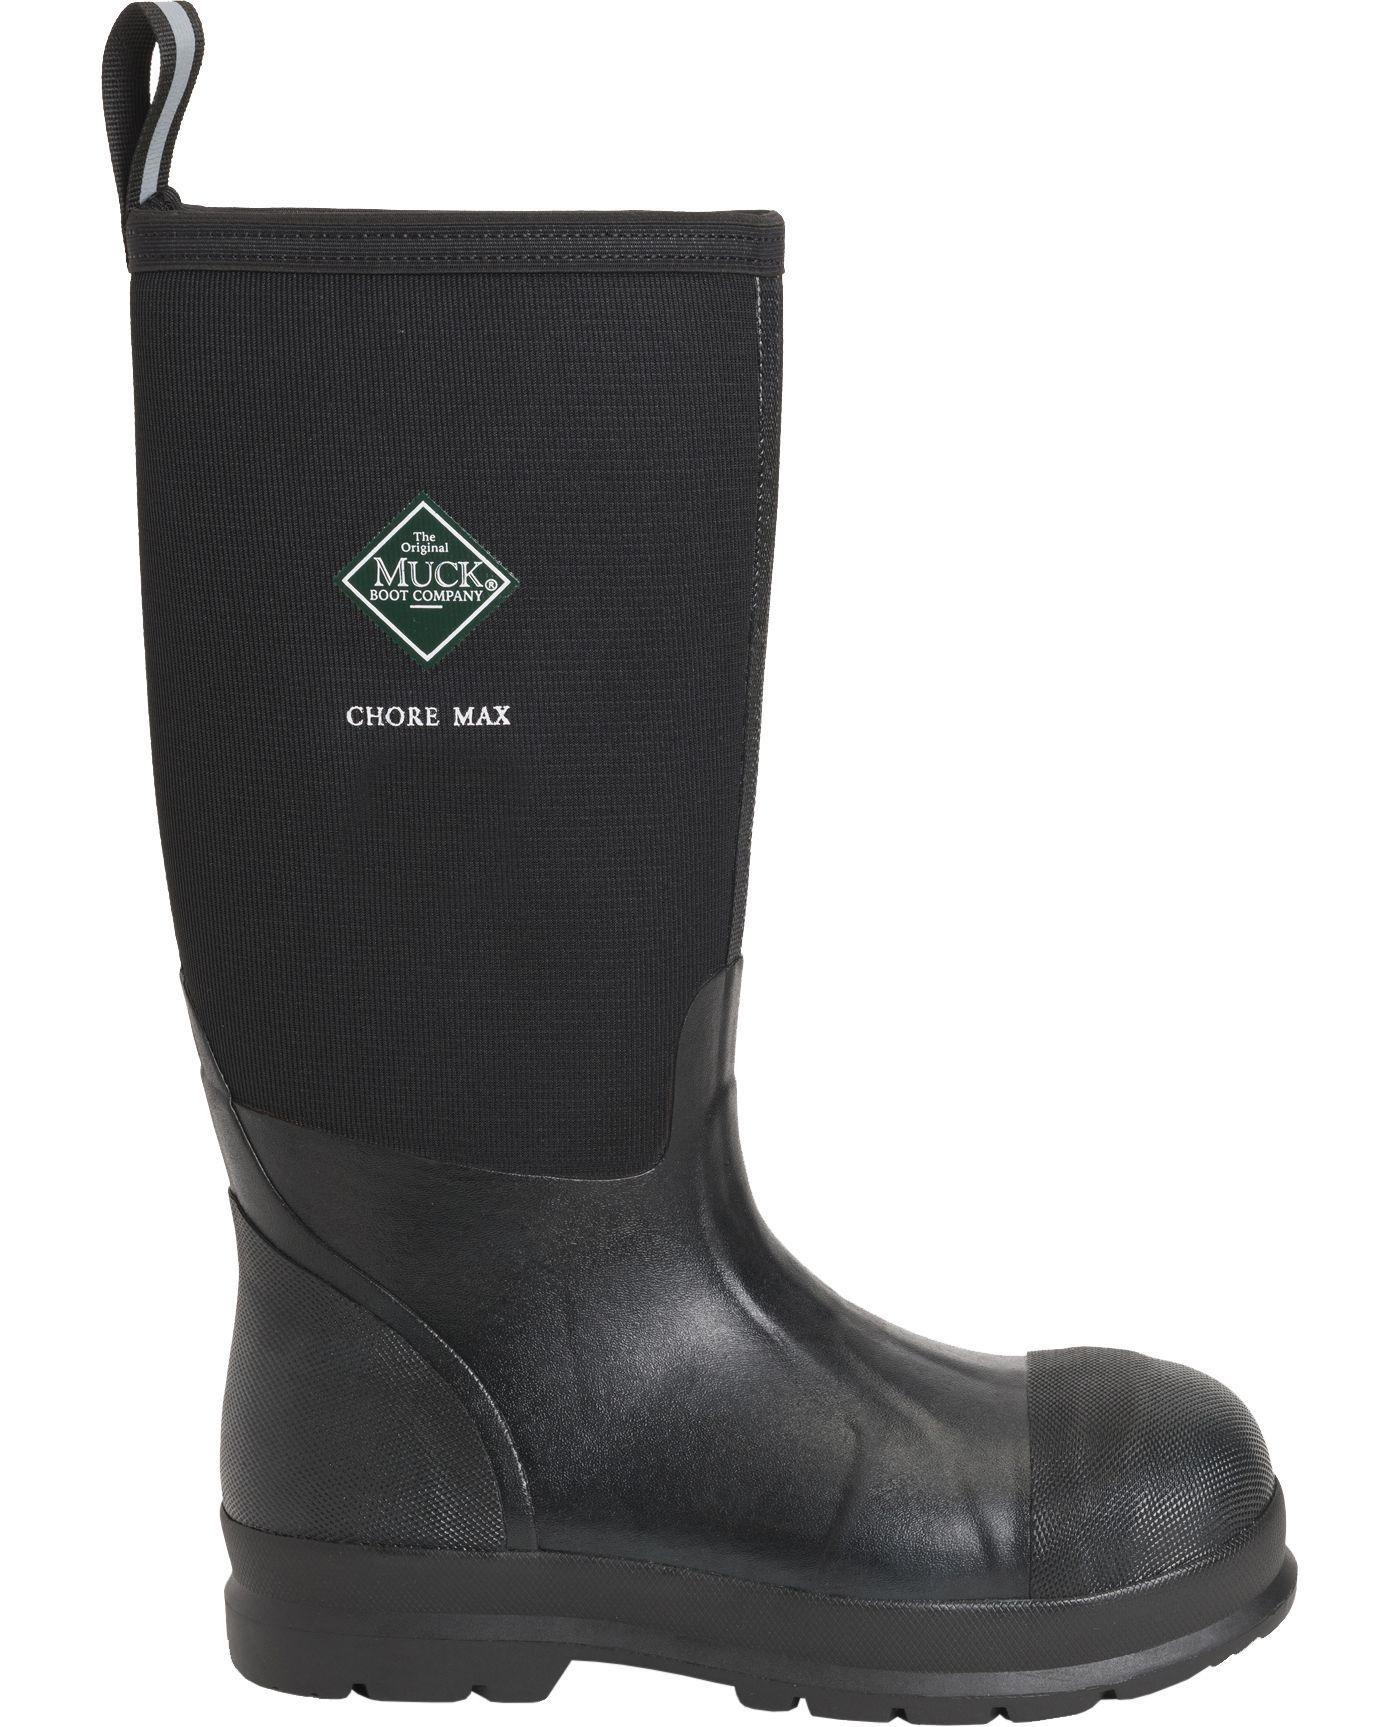 Muck Boots Men's Chore Max Hi Composite Toe Rubber Work Boots